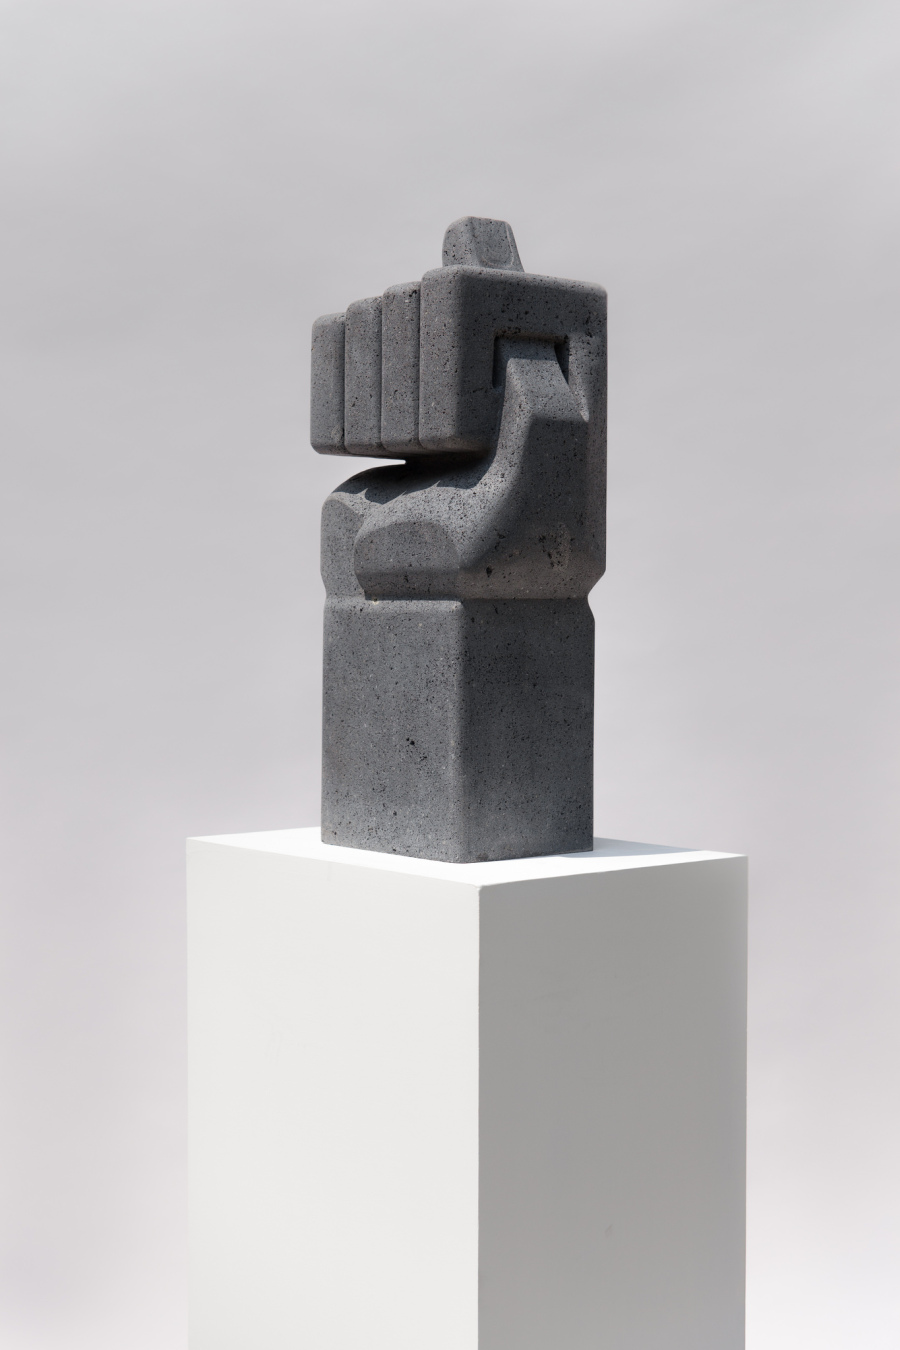 Pedro Reyes, Figa, 2017, roca volcánica, 70 x 30 x 22 cm © Galeria Luisa Strina